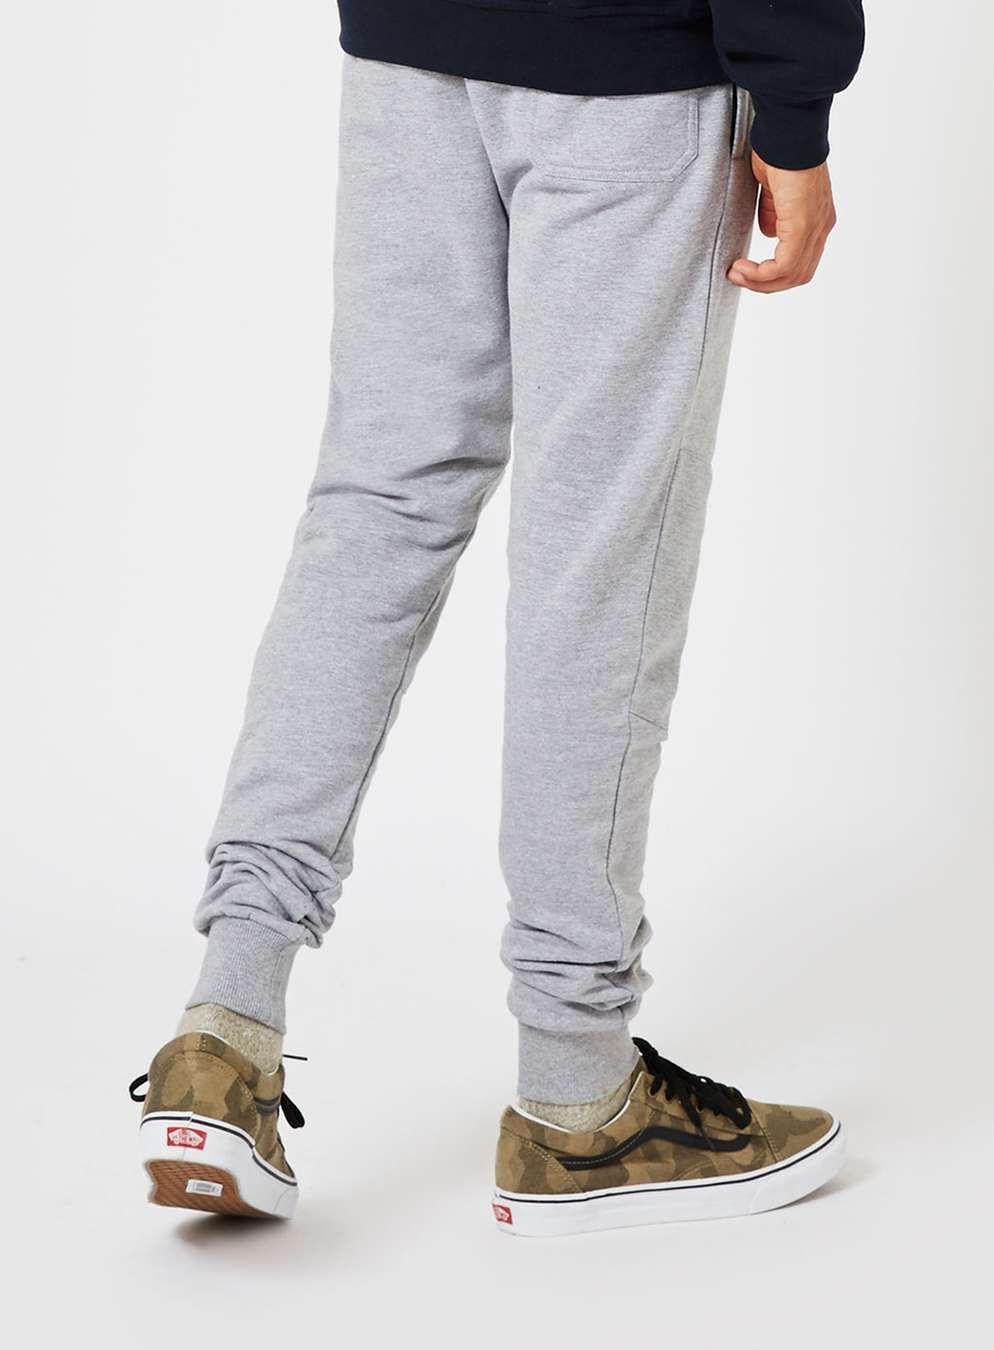 NICCE Grey Marl Panelled Joggers - Loungewear & Sweatpants - Clothing -  TOPMAN USA